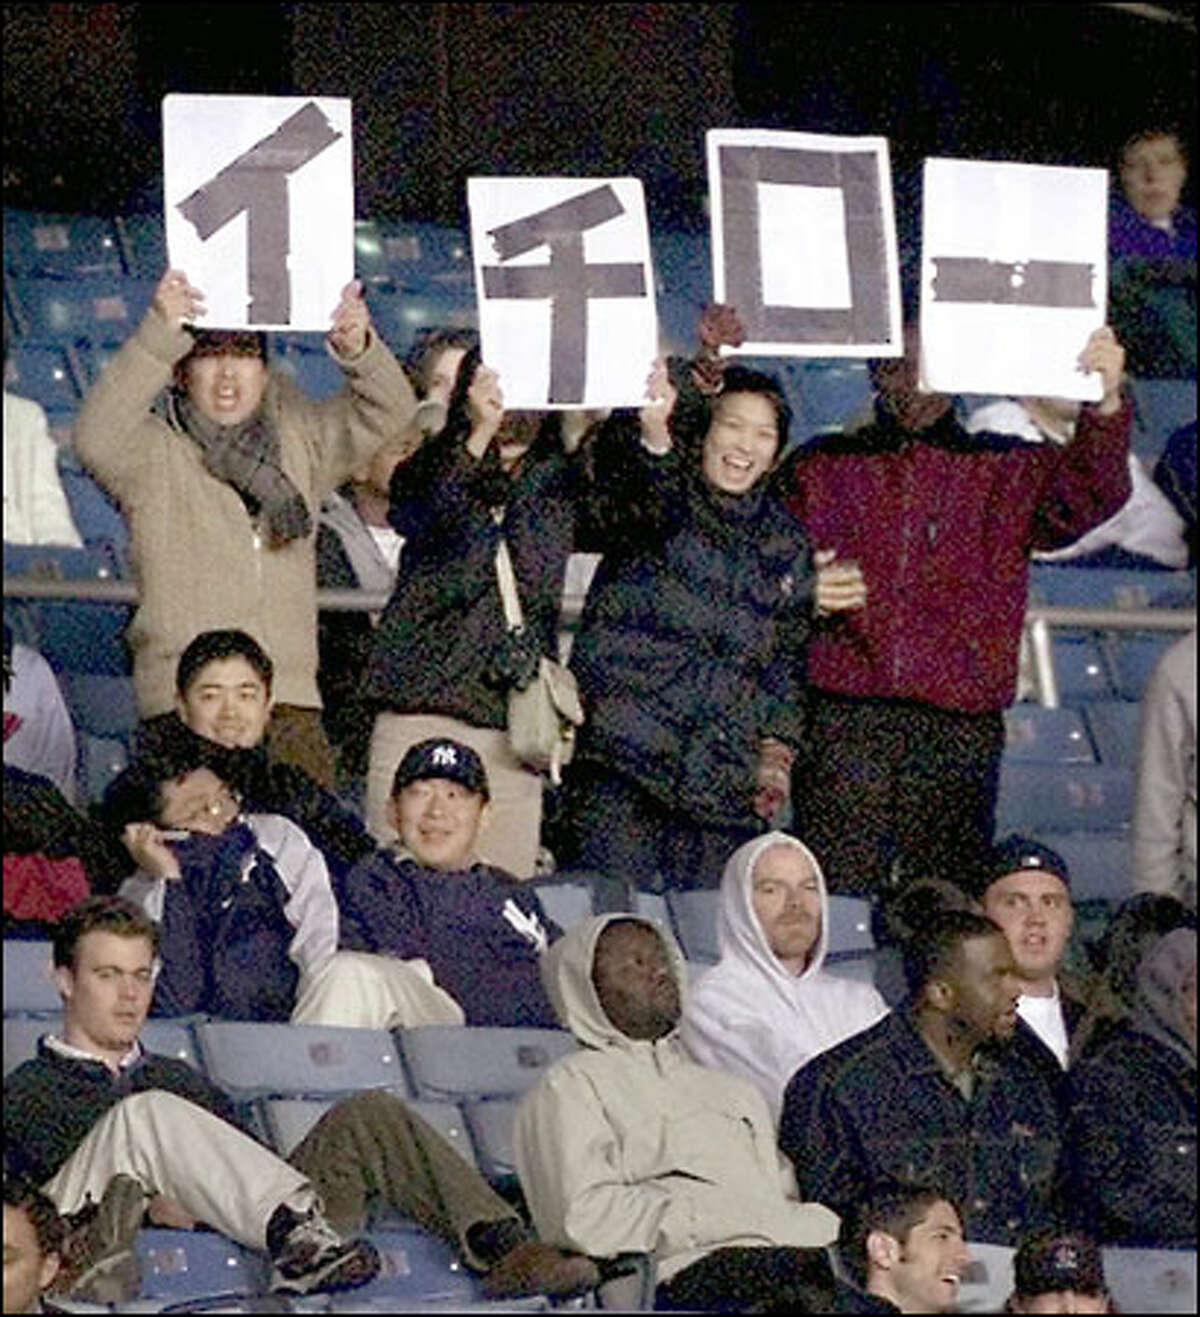 Fans of Mariners right fielder Ichiro Suzuki wave signs that spell Ichiro in the eighth inning of last night's game against the Yankees.